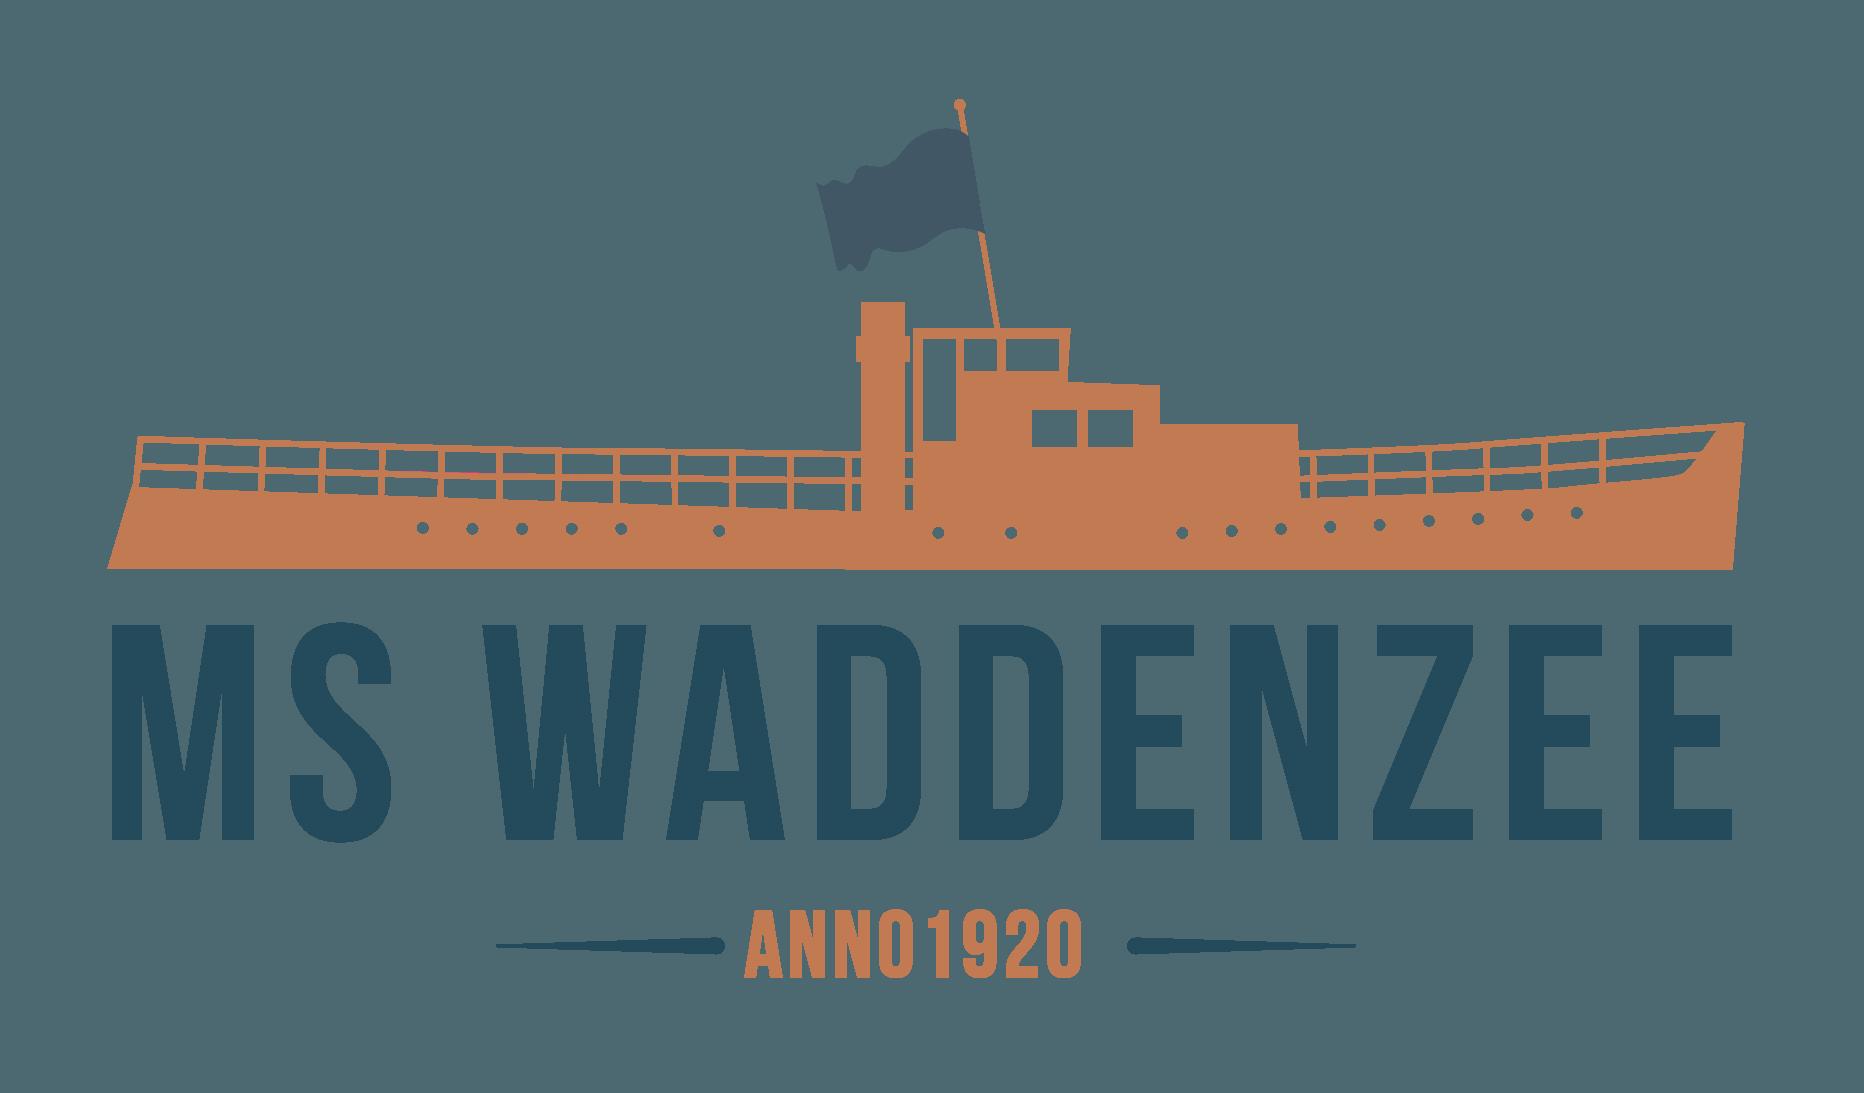 mswaddenzee